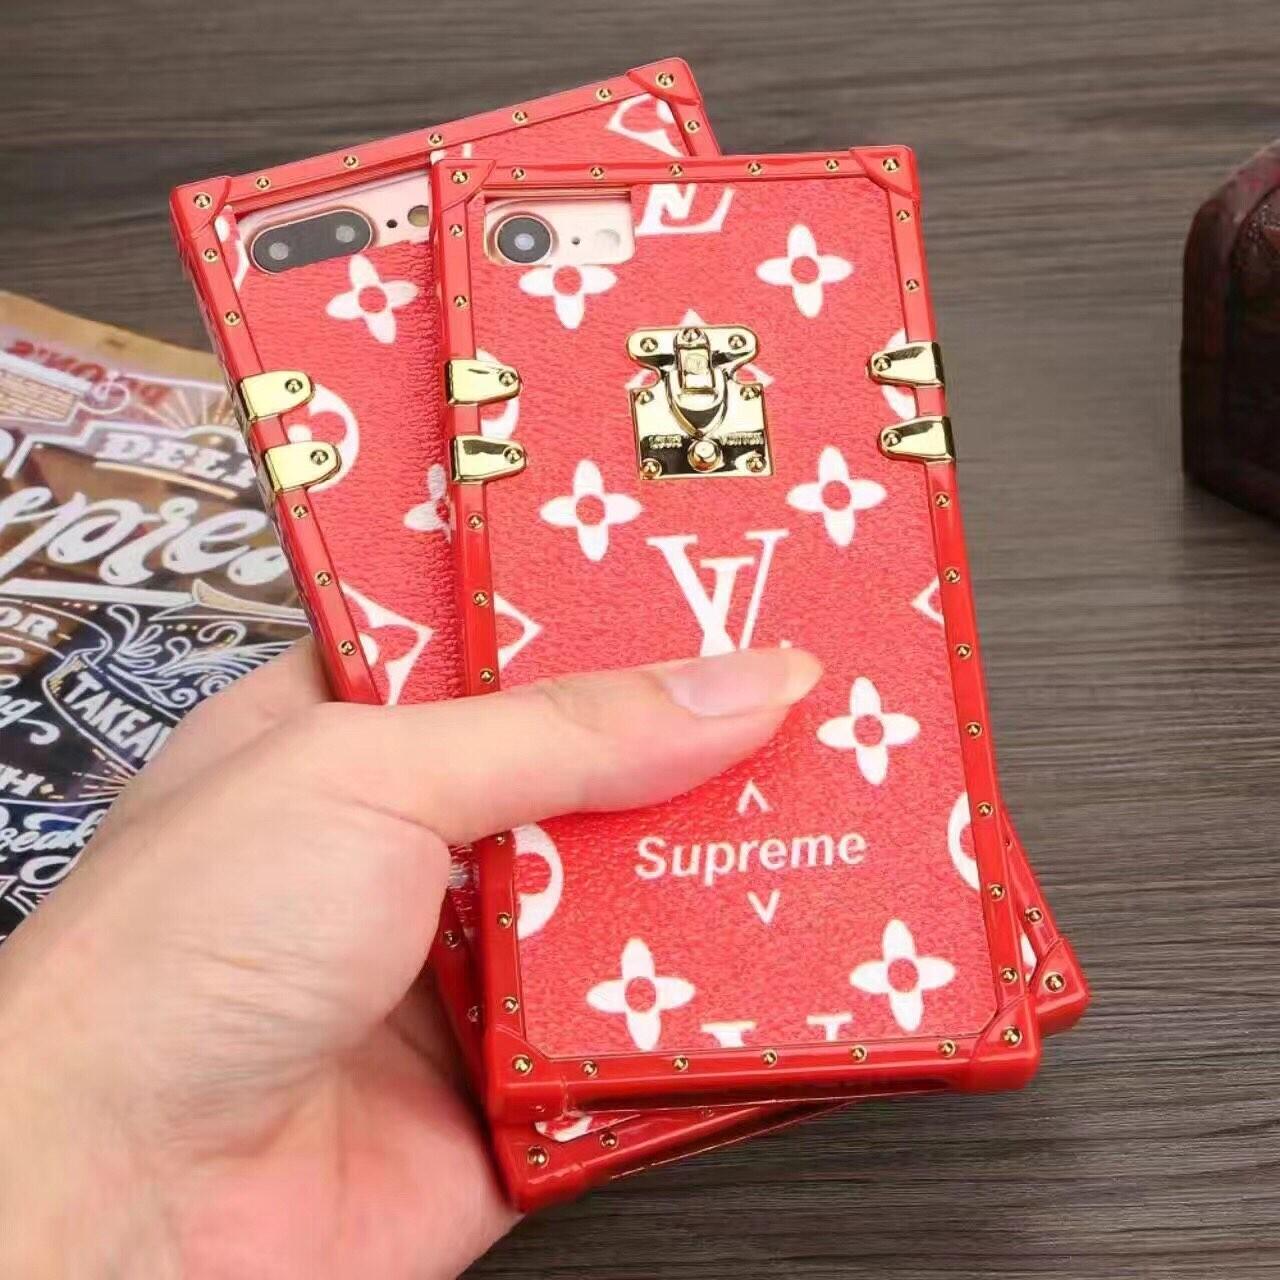 1d529d499563 Supreme x Louis Vuitton Black Shaking Design iPhone 8 Plus Case. null.  null. null